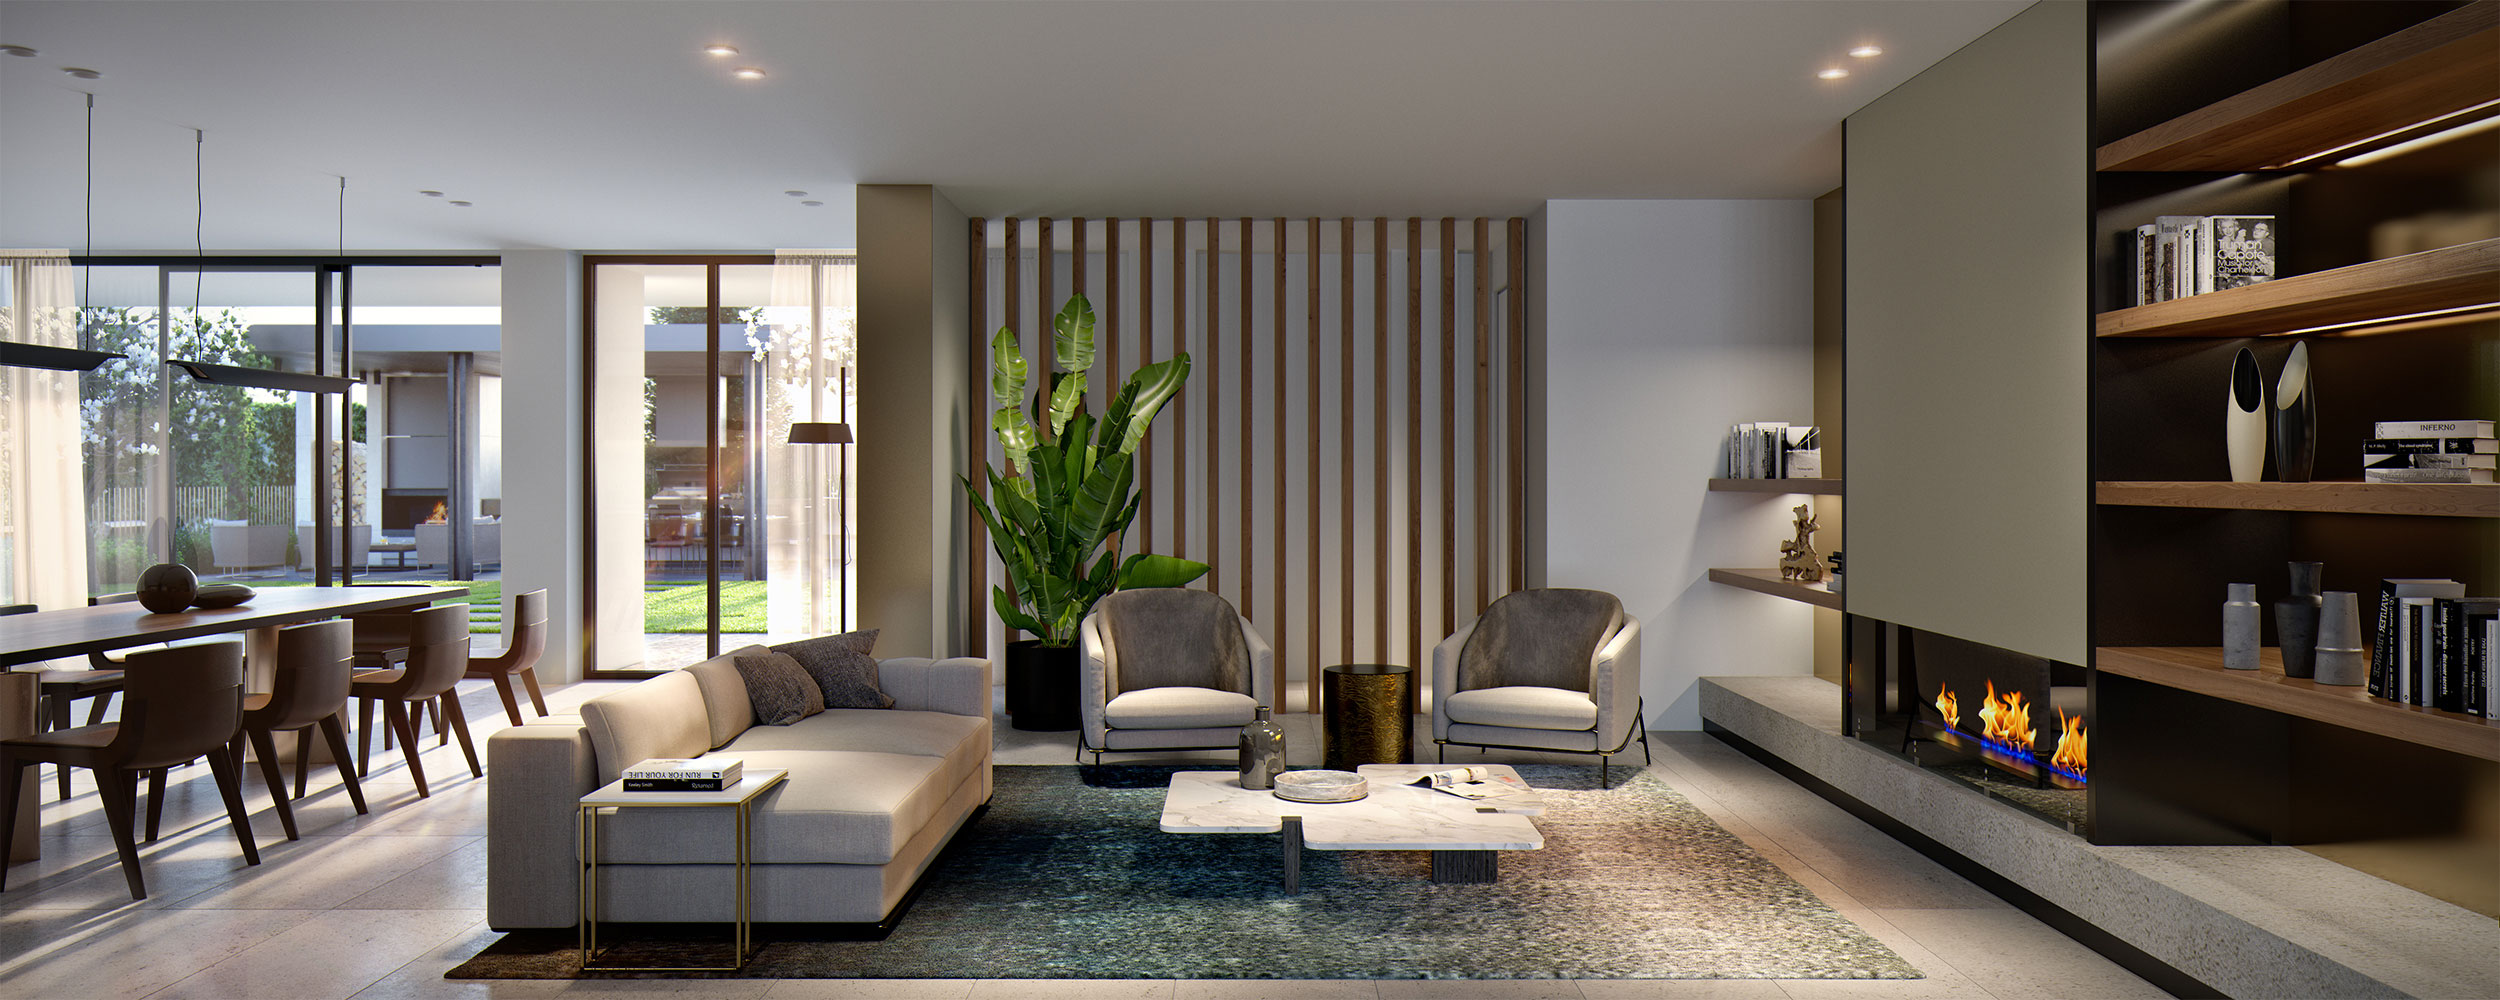 Botanic living room